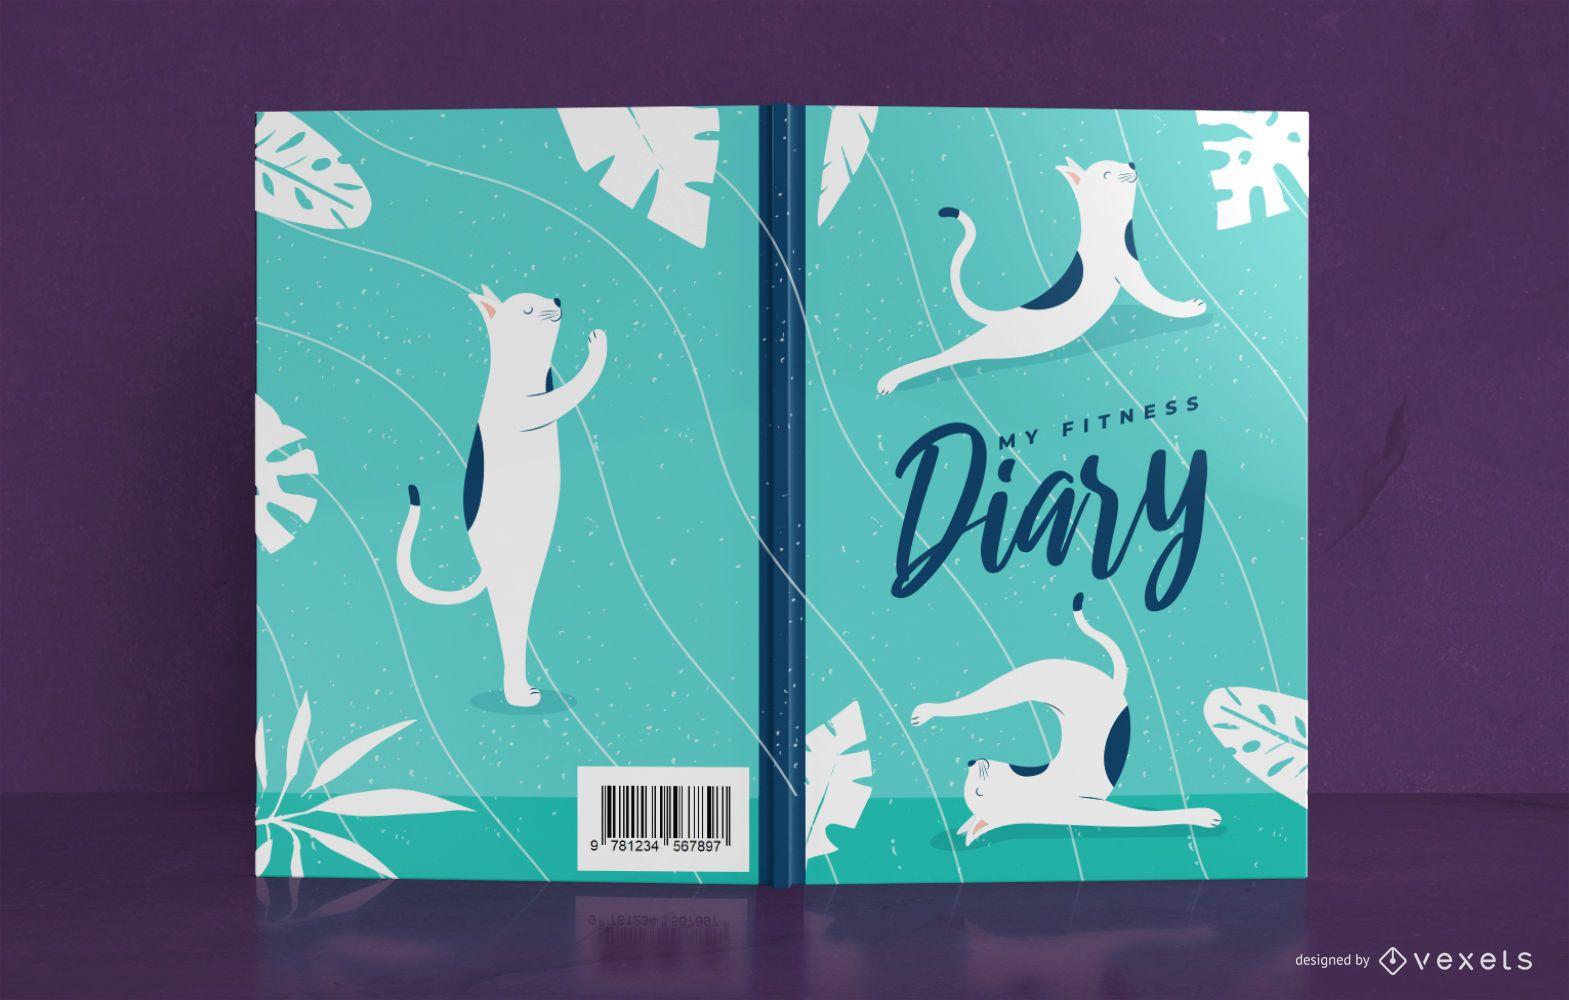 Yoga cat Diary Book Cover Design